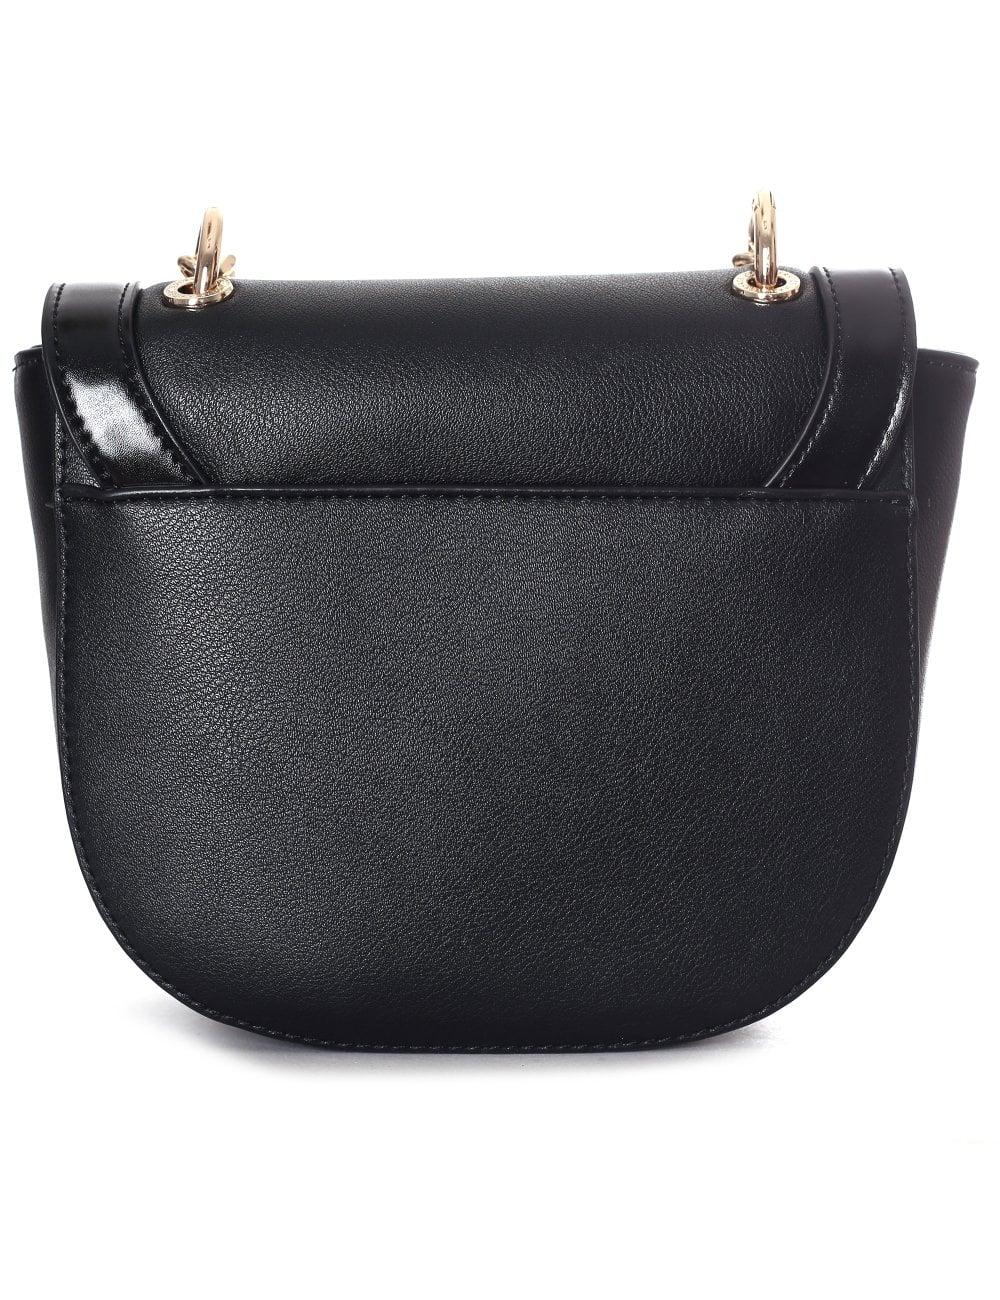 b40225826b Versace Jeans Women s Large Stud Chain Cross Body Bag Black